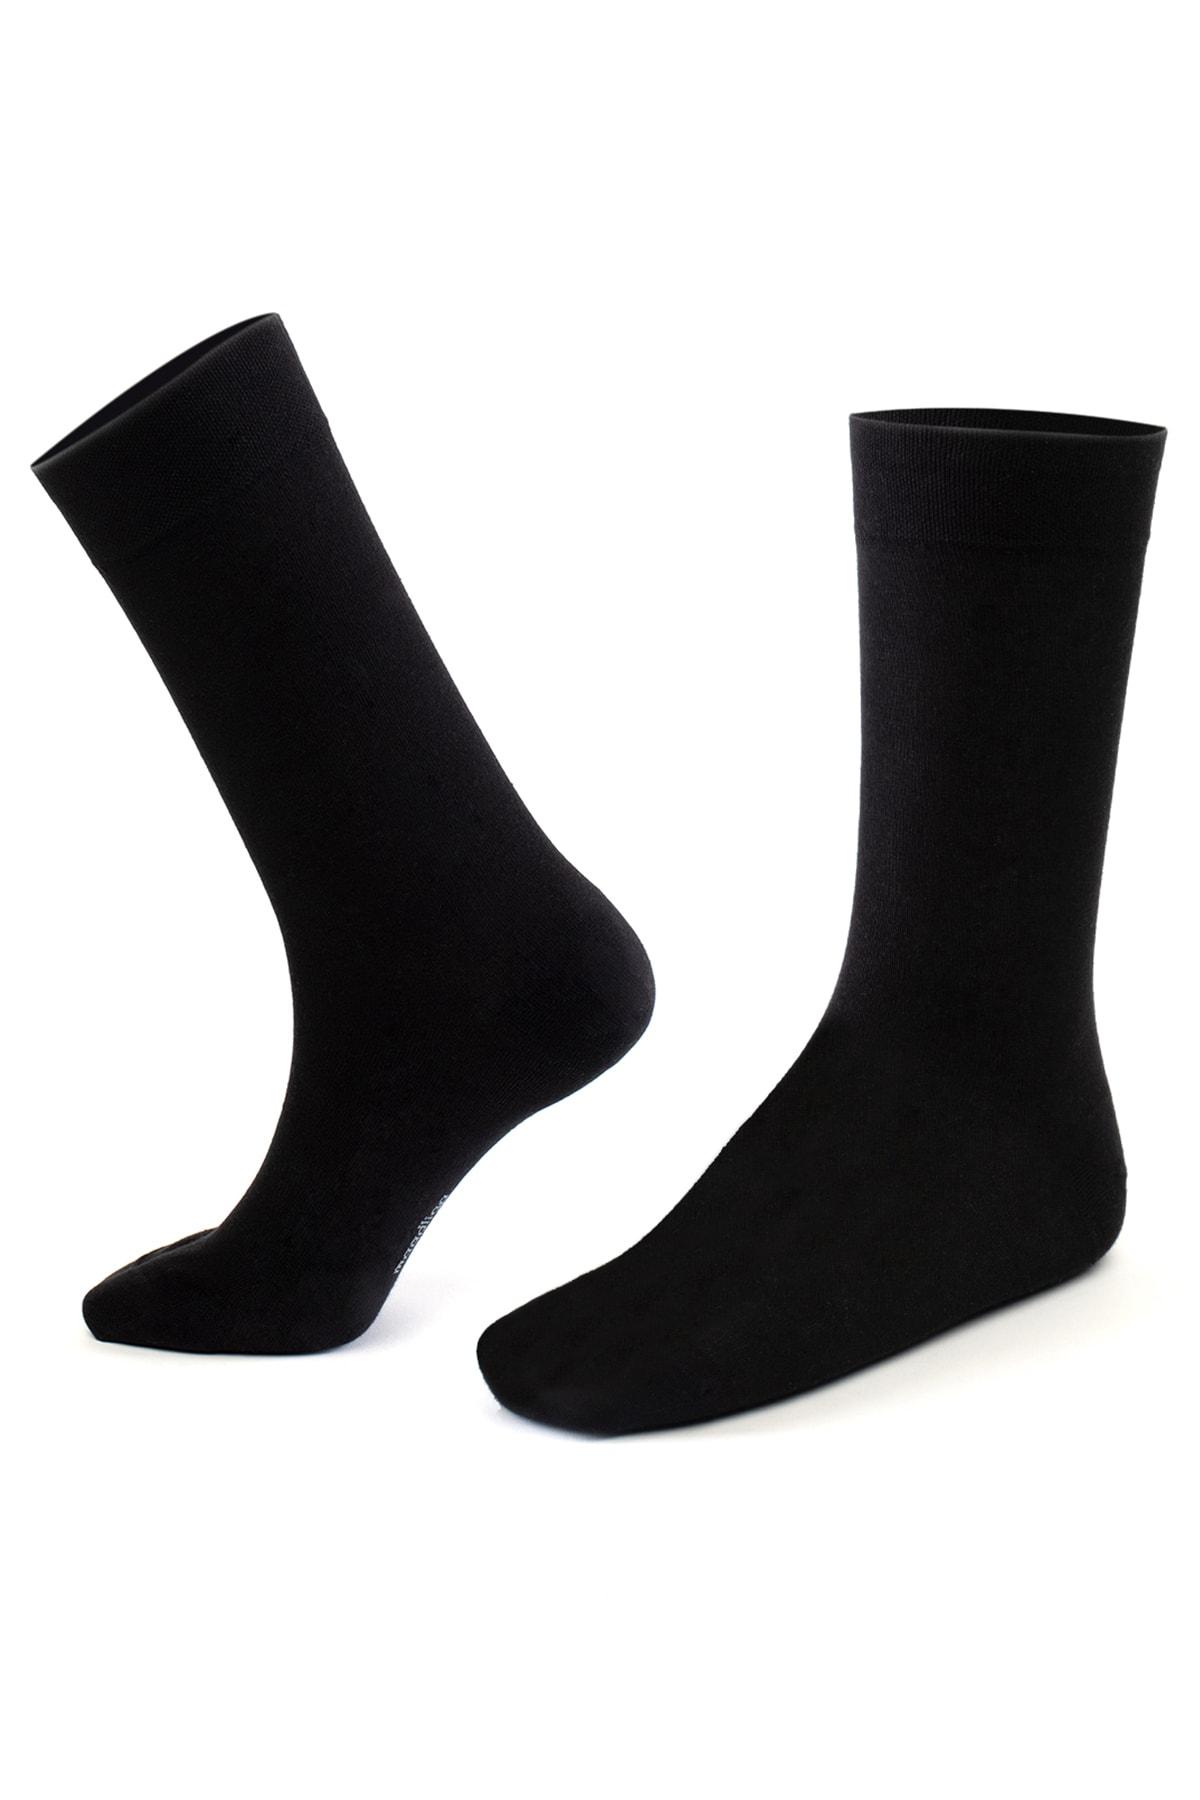 Moodligo Erkek Siyah Premium Bambu Çorap 6 lı 2